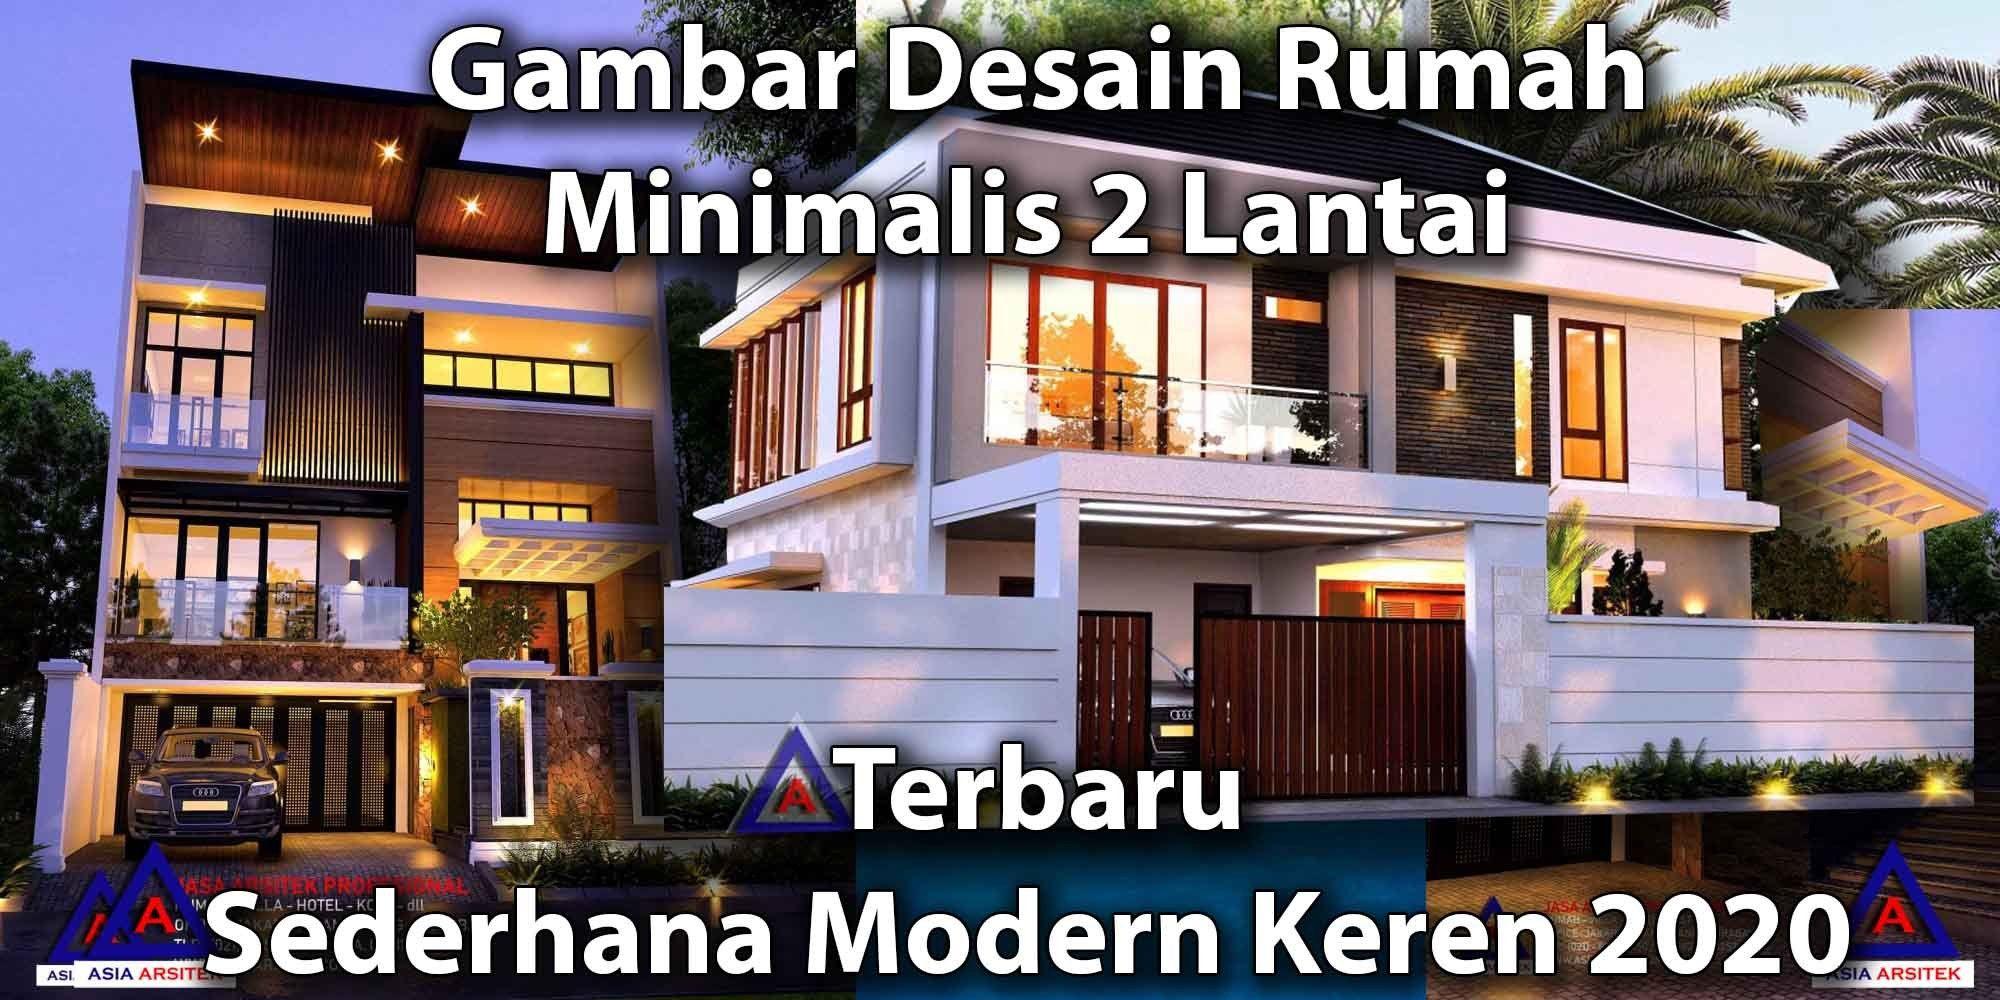 Desain Rumah Cantik Minimalis 2 Lantai Download Wallpaper Desain Rumah 2 Lantai Desain Rumah Home Fashion